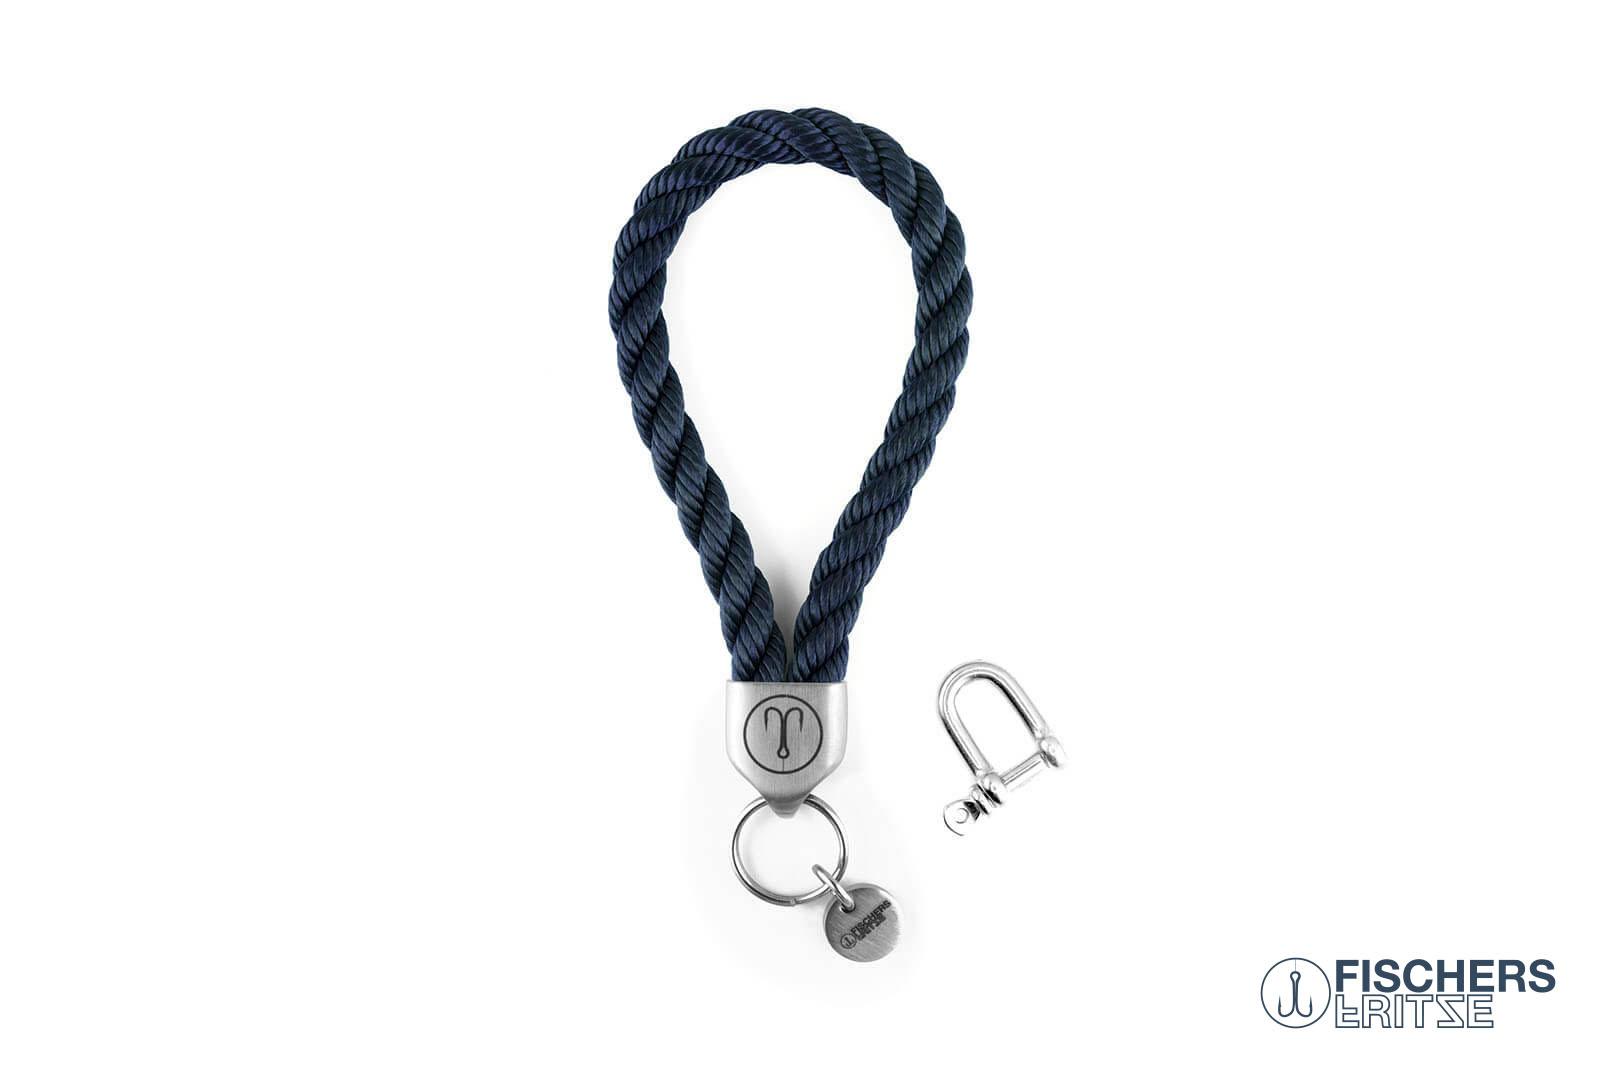 armband-fischers-fritze-dickerhering-marineblau-gedreht-segeltau-schaekel